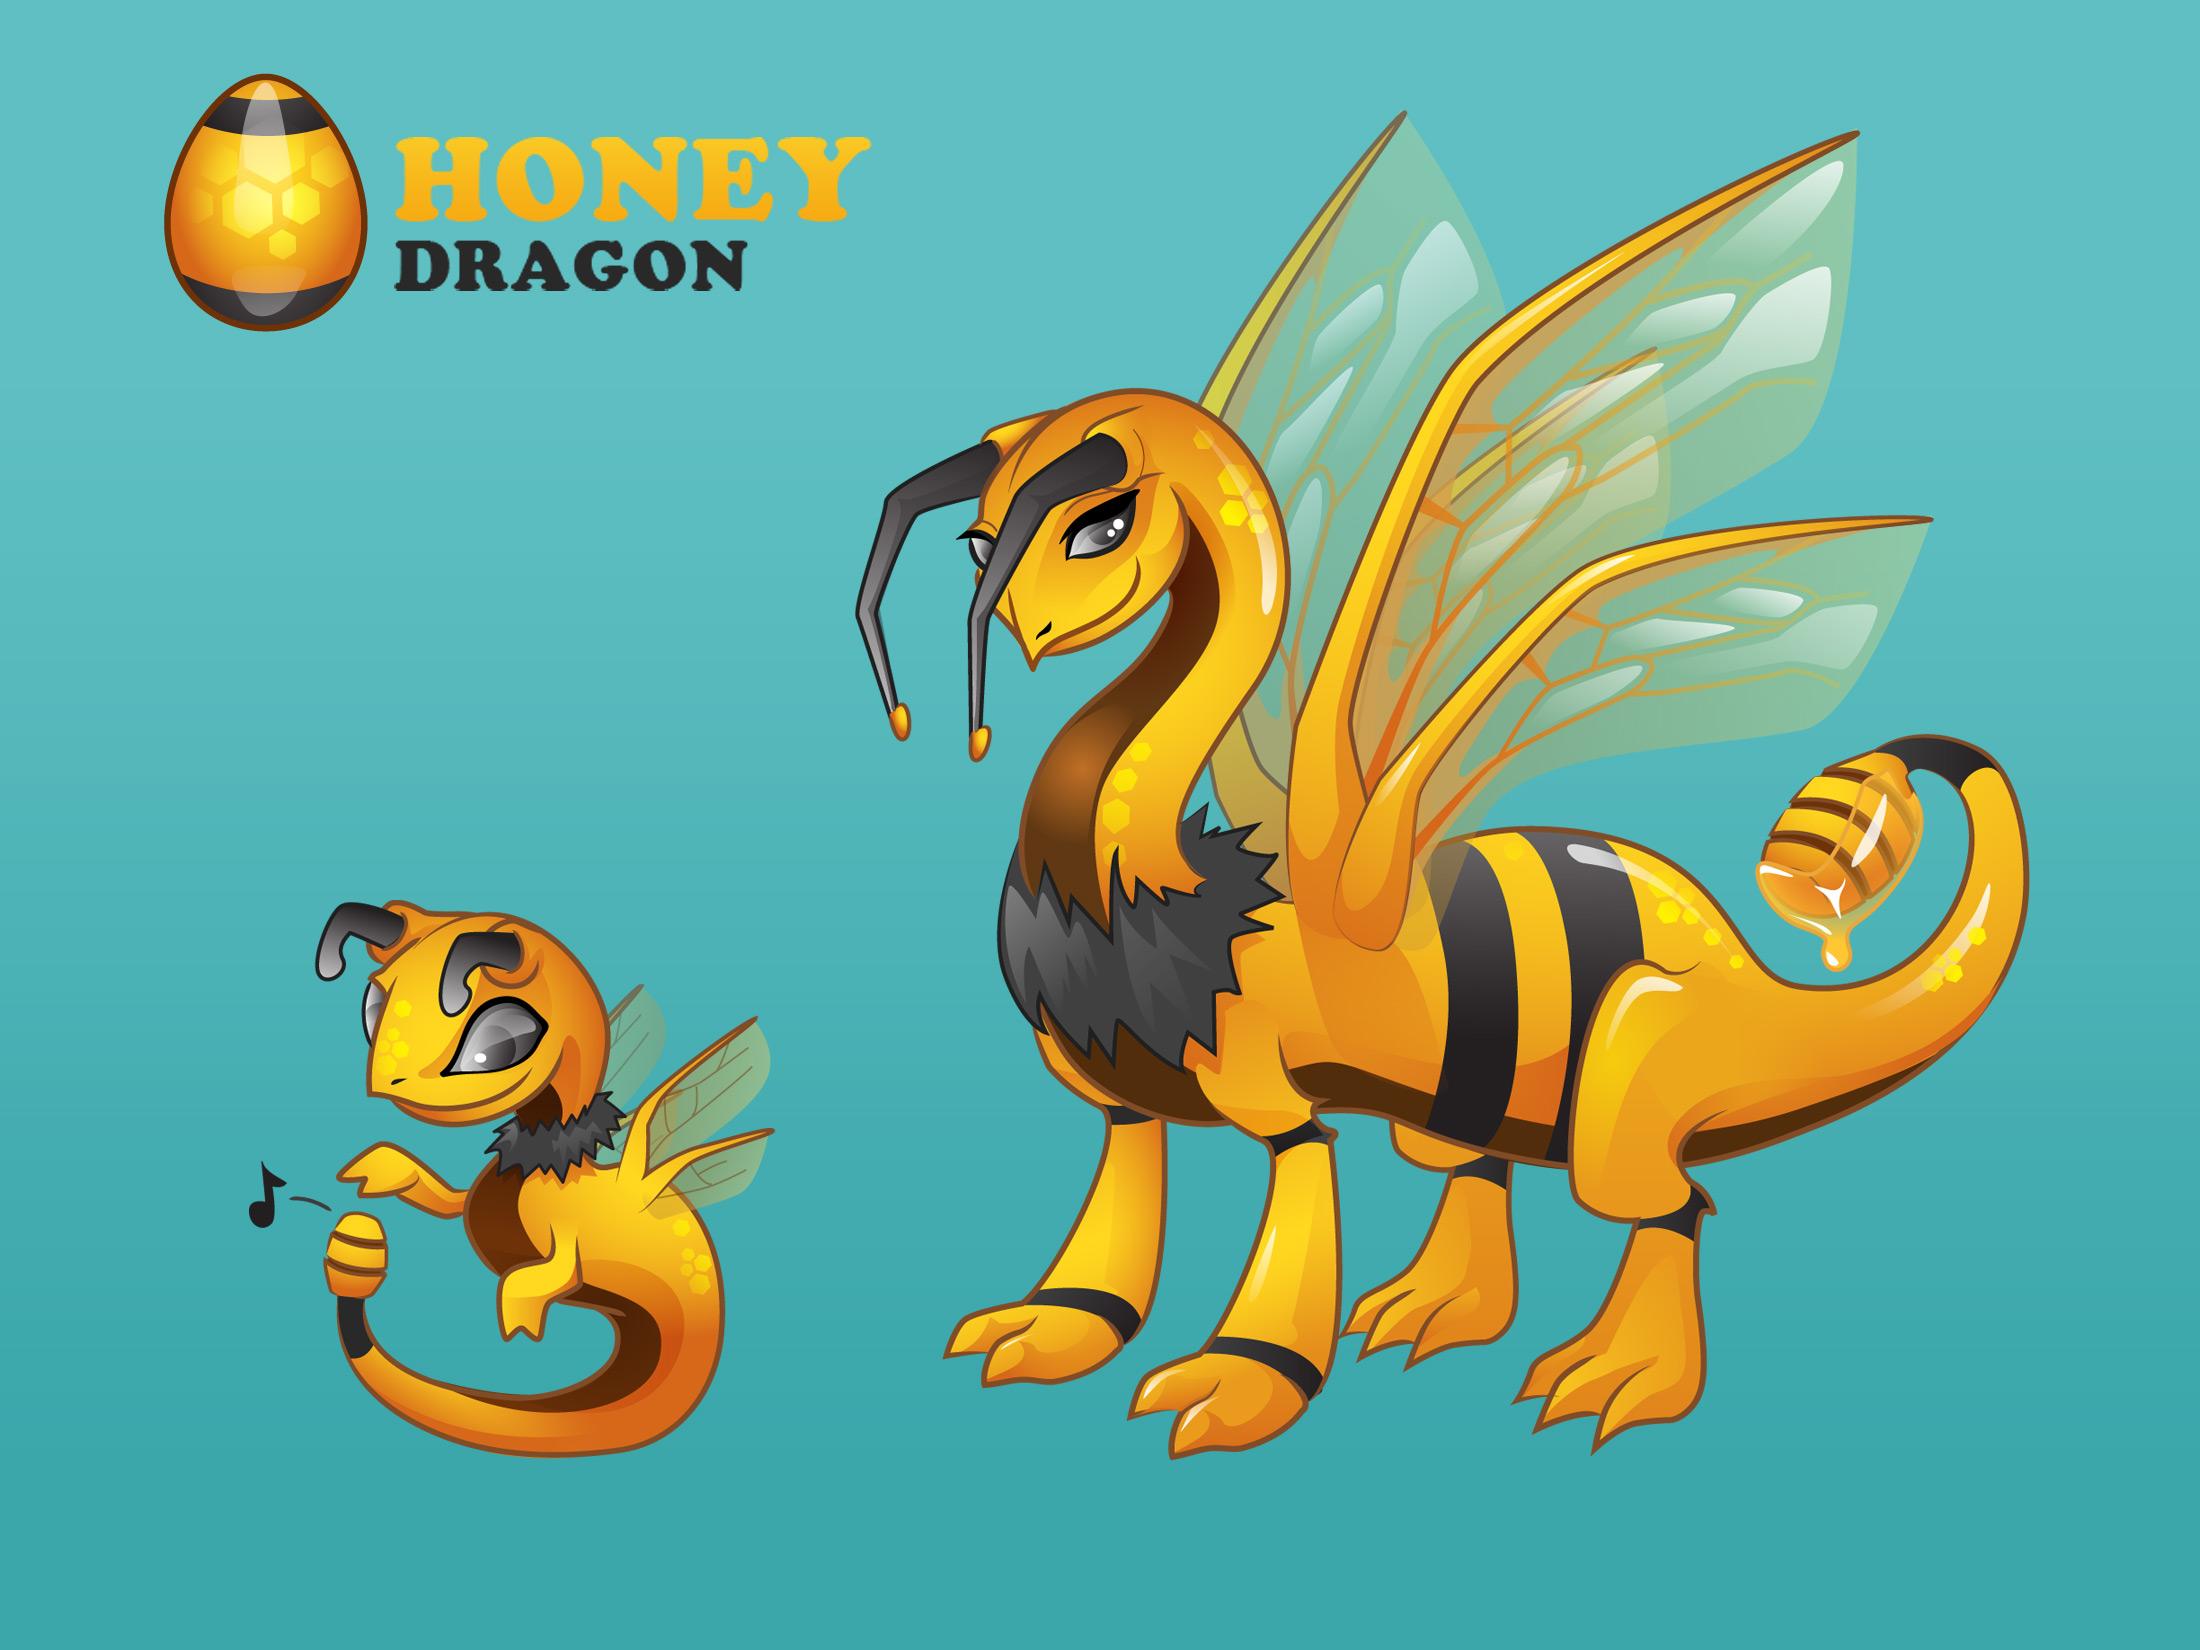 Dragons 2012 - Honey Dragon